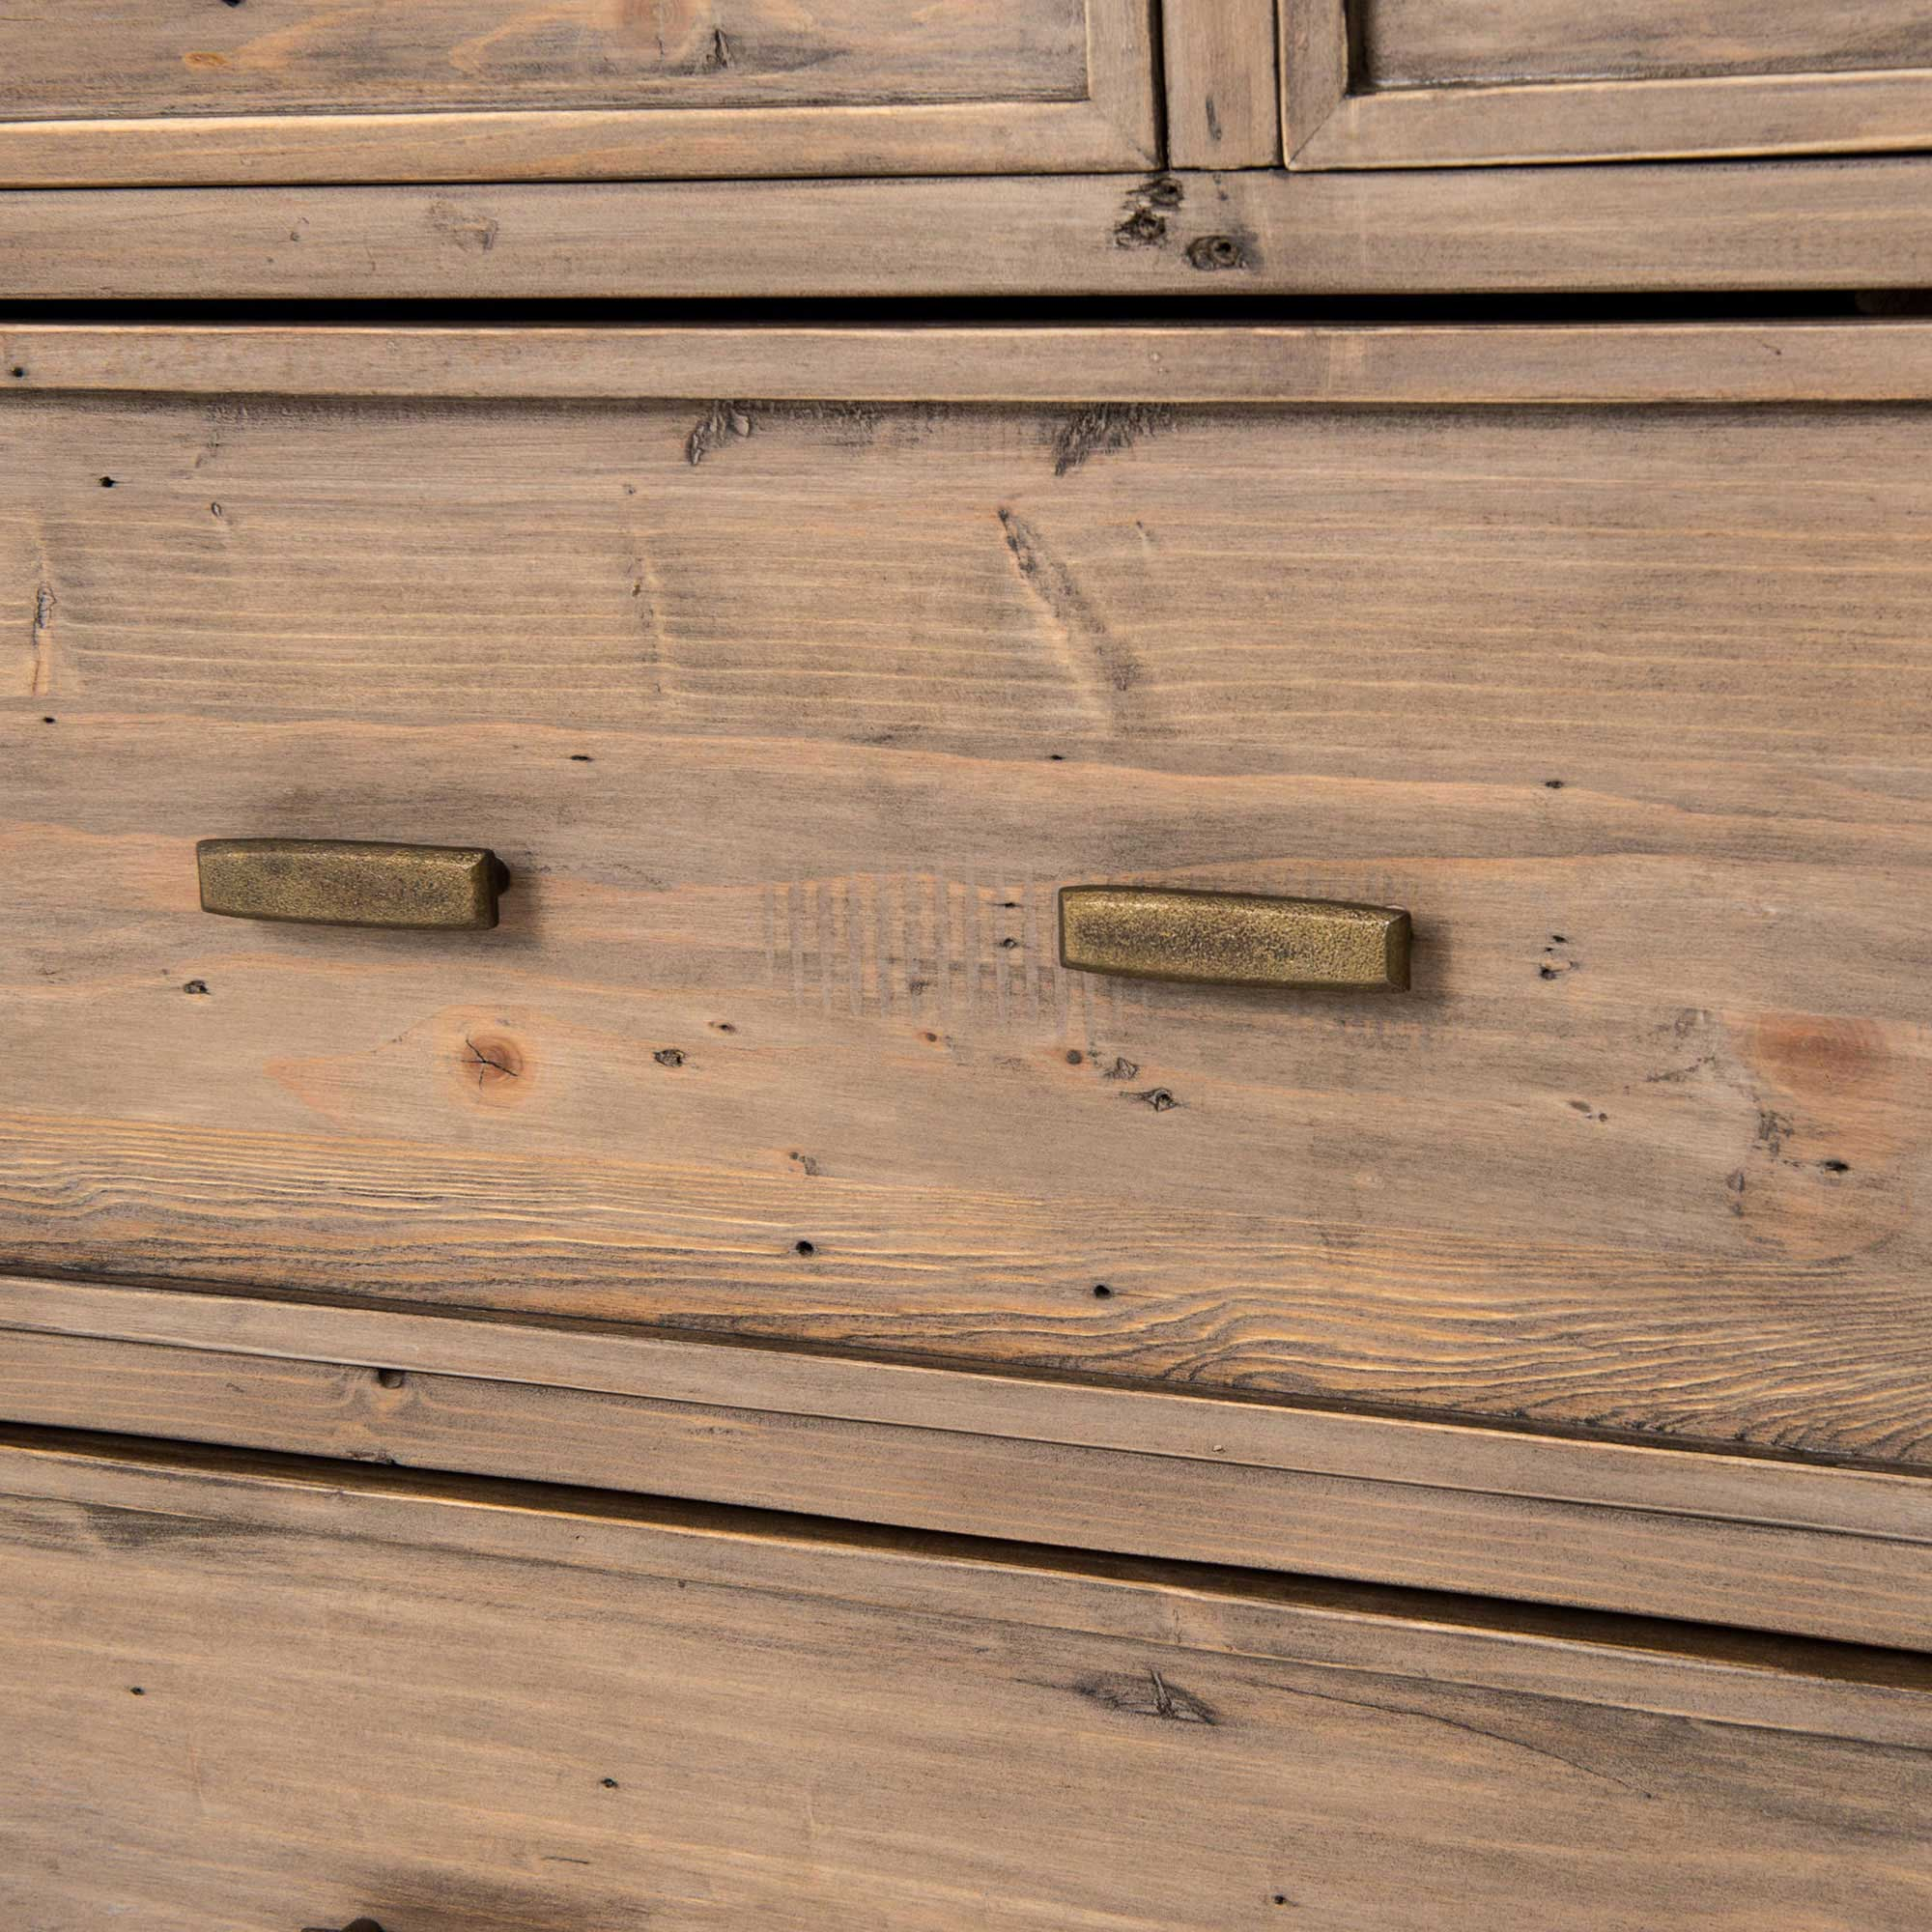 Tom Rustic Reclaimed  Pine Antique Brass Dresser